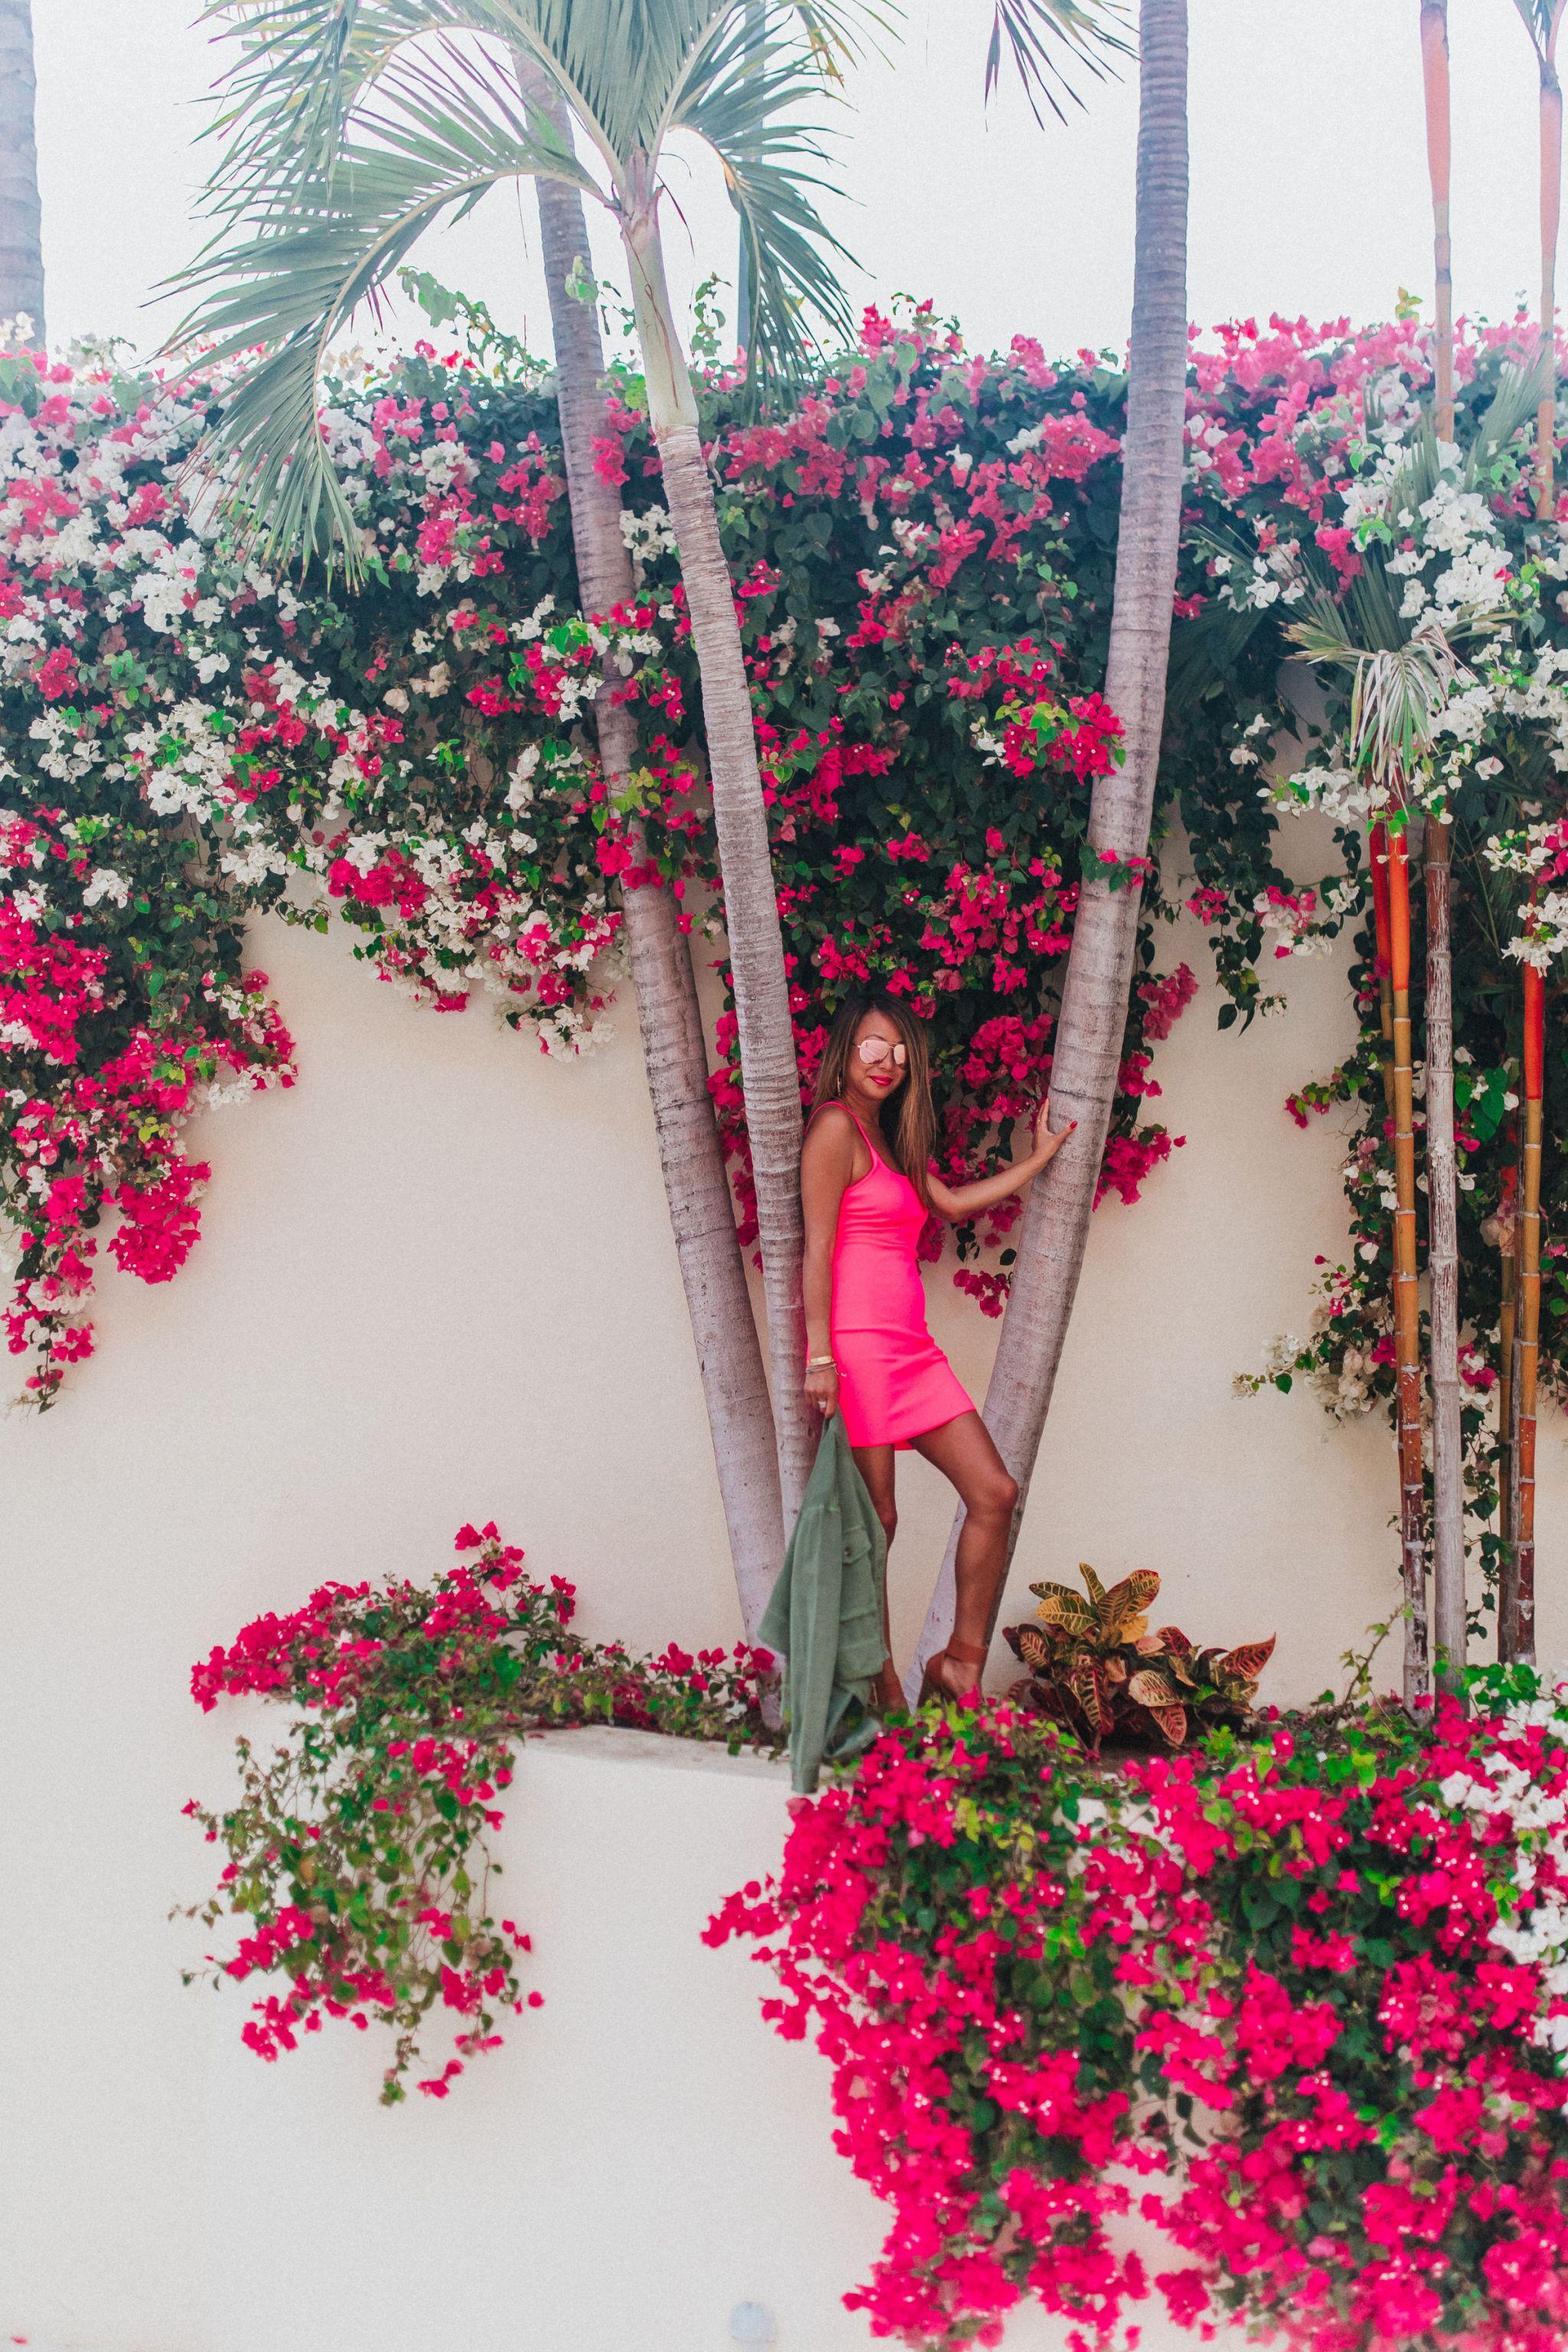 Grand Velas Riviera Nayarit, grand Velas resort, grand velas riviera nayarit in Mexico, Mexico girls trip, Mexico travel guide, travel blogger, Chicago blogger, Jennifer Worman, best resort in Mexico, Puerto Vallarta Mexico vacation, best resort in puerto Vallarta, where to stay in Puerto Vallarta